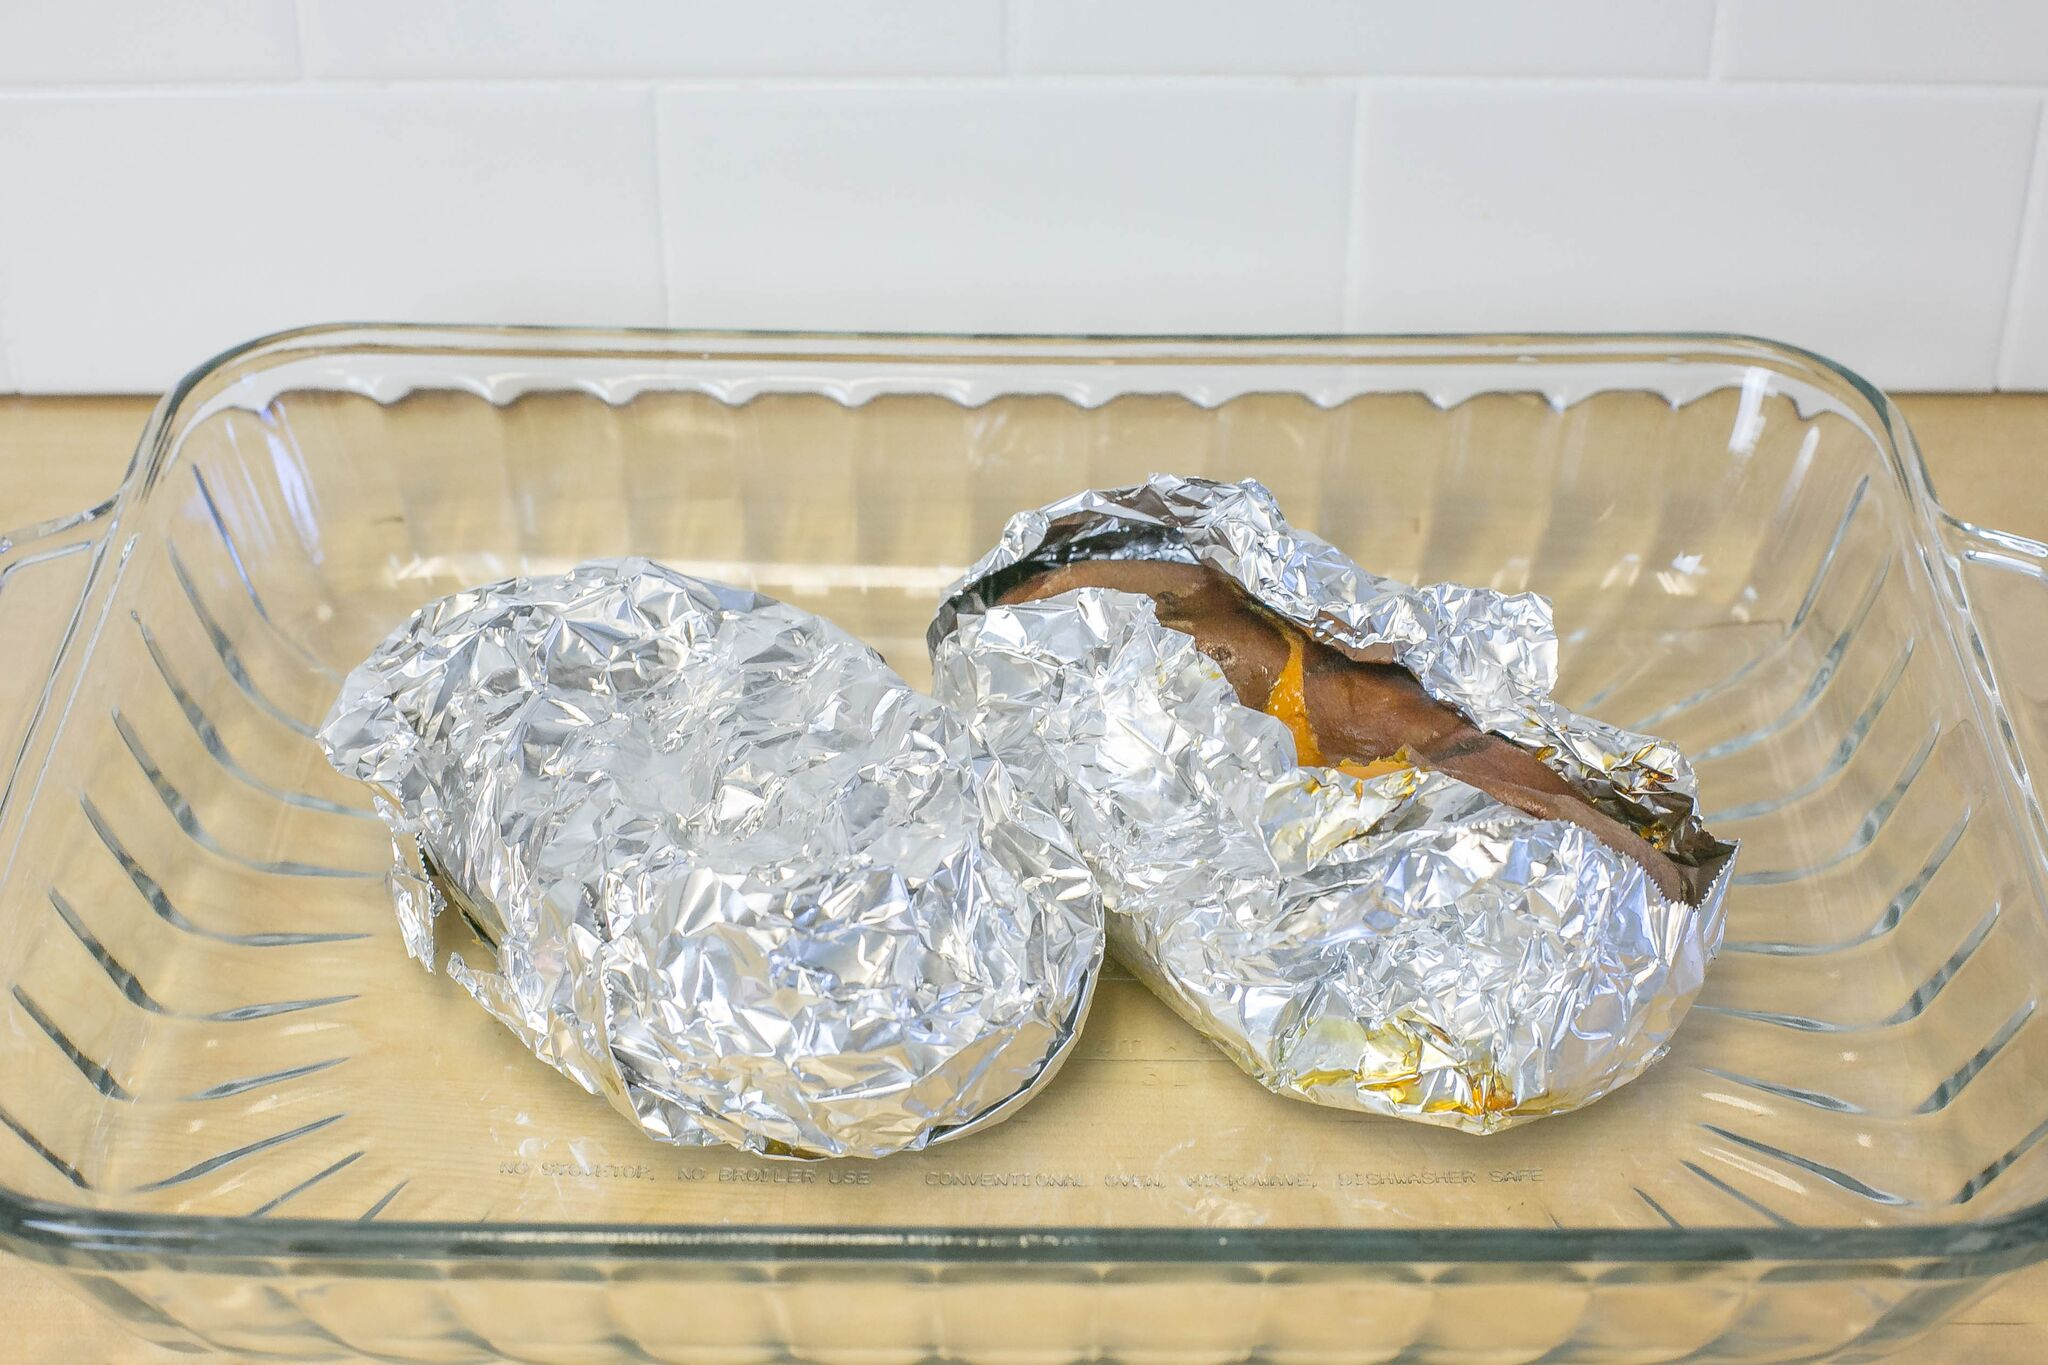 potatoesroasted